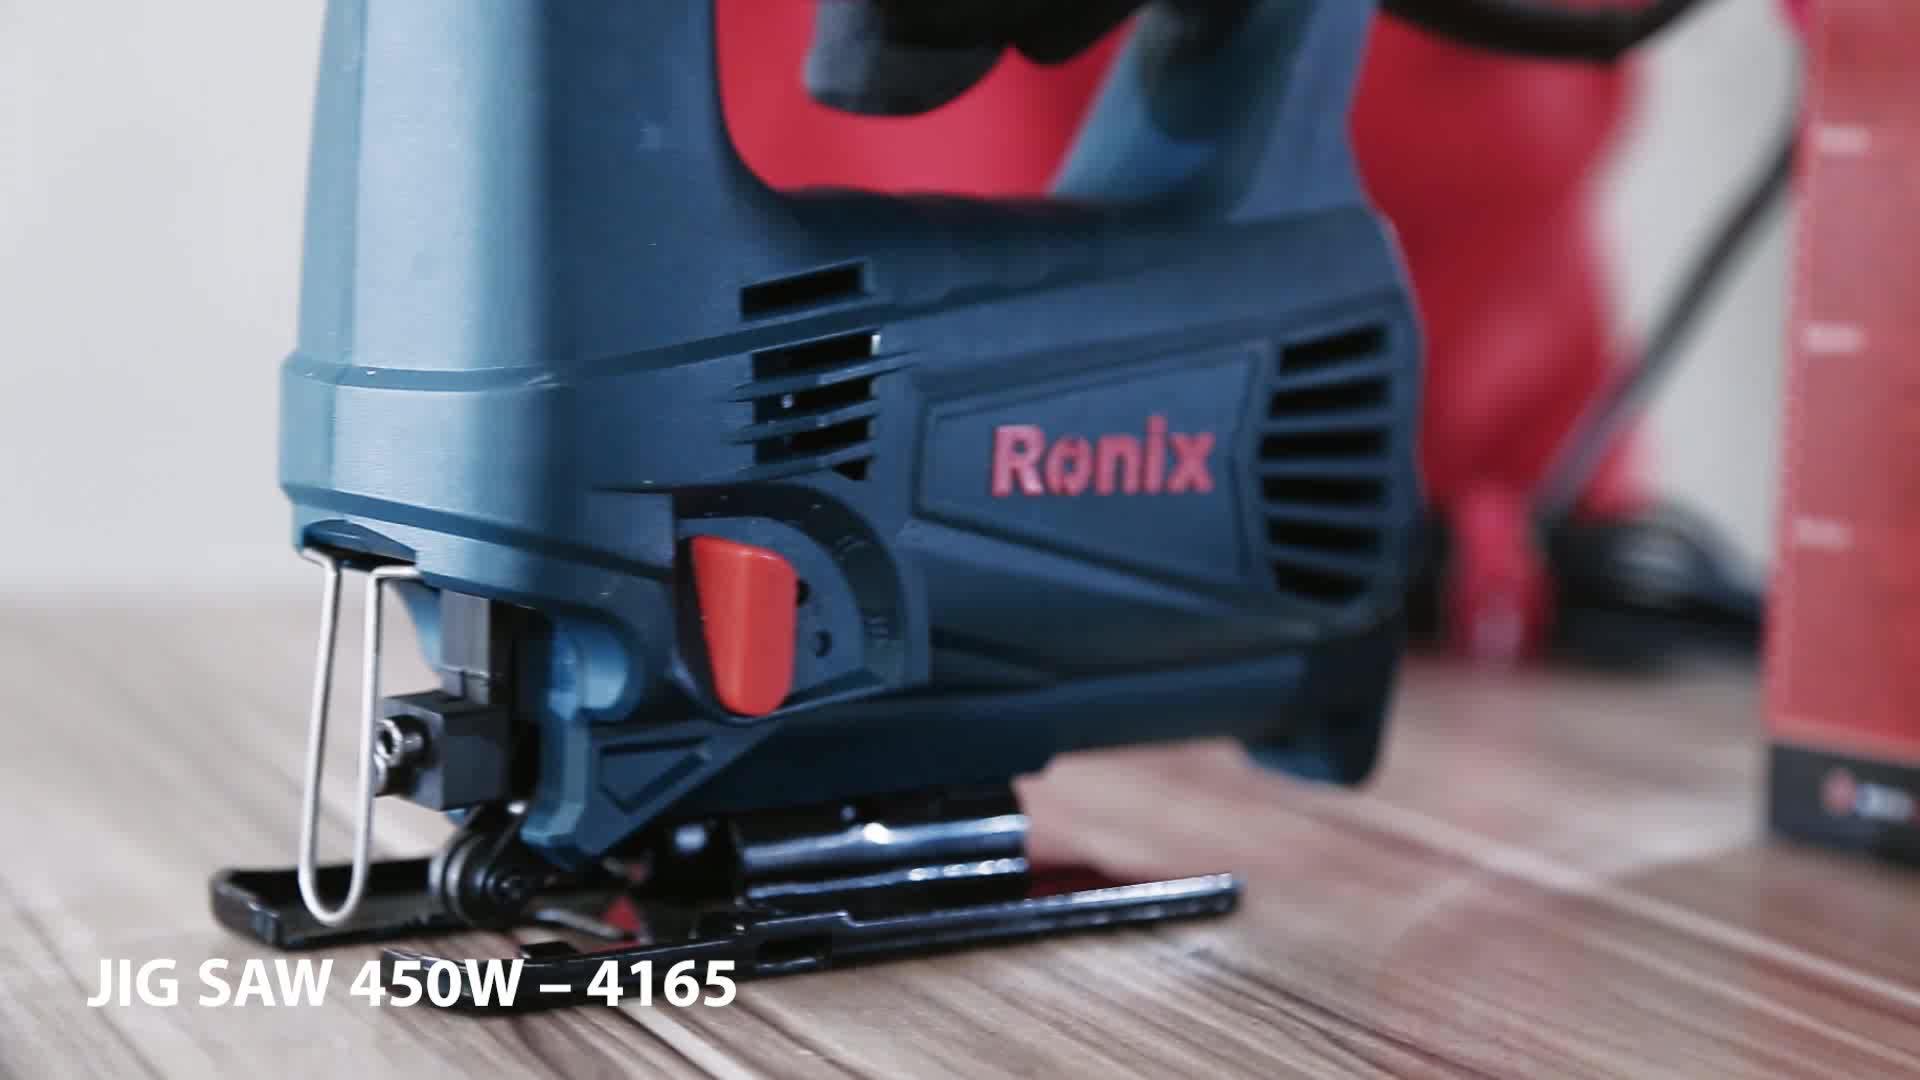 RONIX YÜKSEK KALITELI 3SPEED-450W elektrikli jig testere makinesi modeli 4165